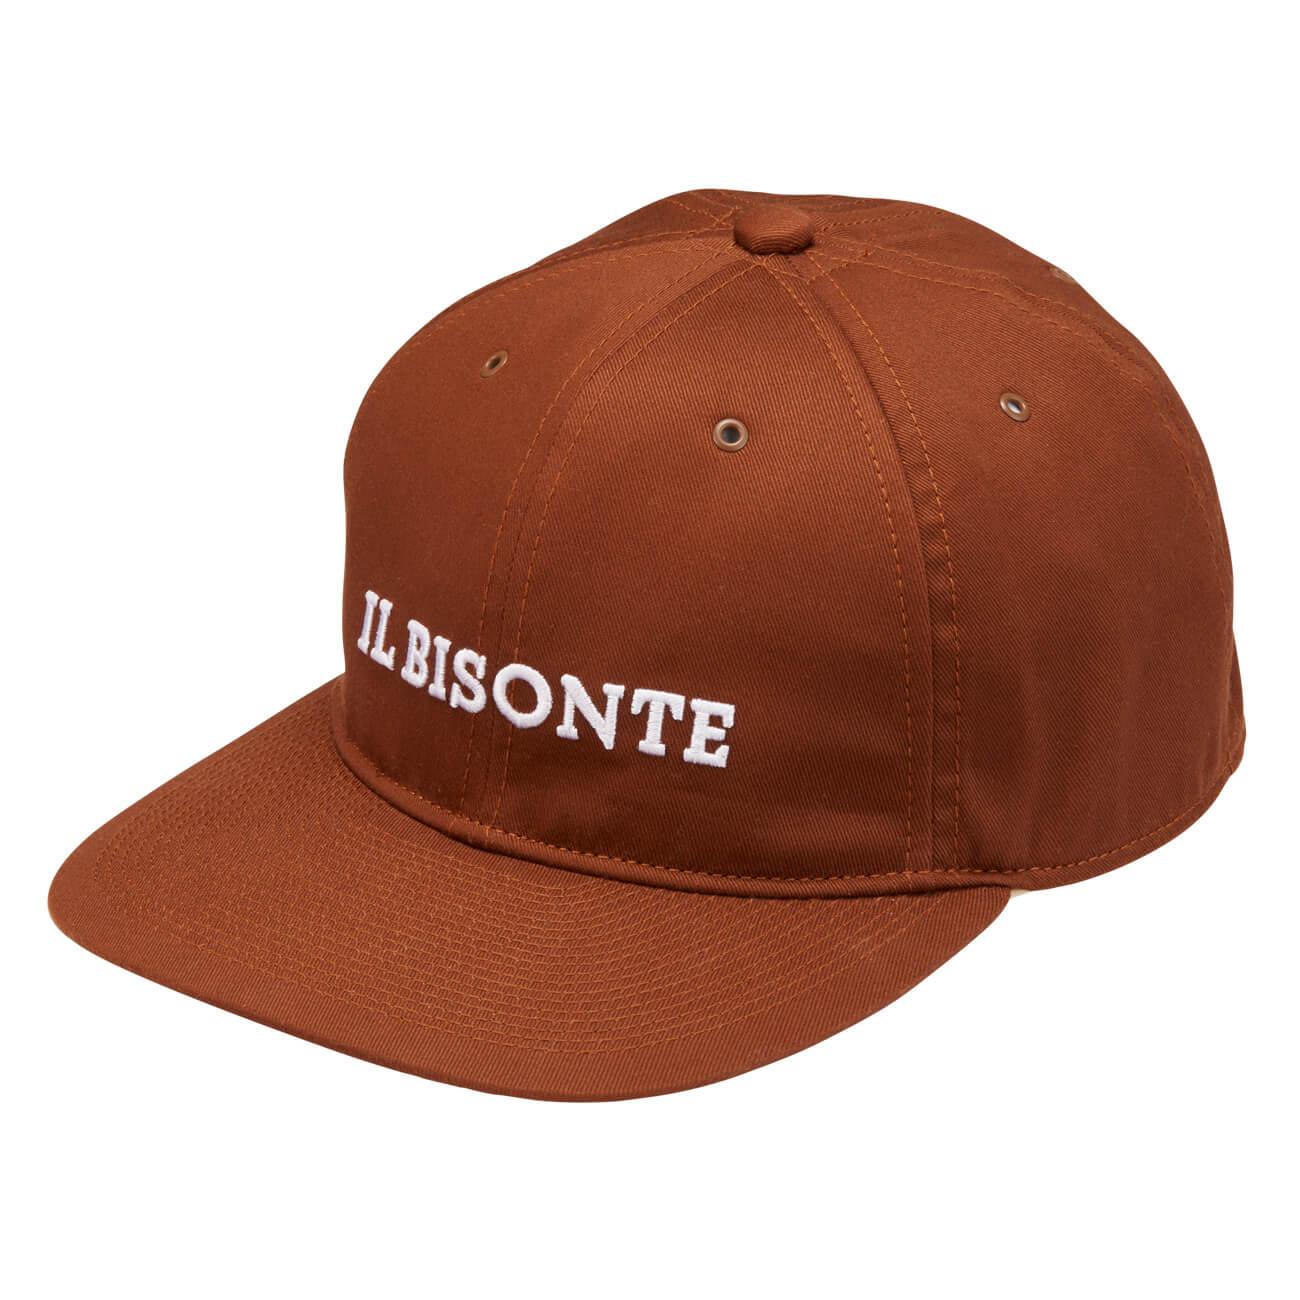 IL BISONTE (イル ビゾンテ) 日本公式オンラインストア キャップ 54192309383